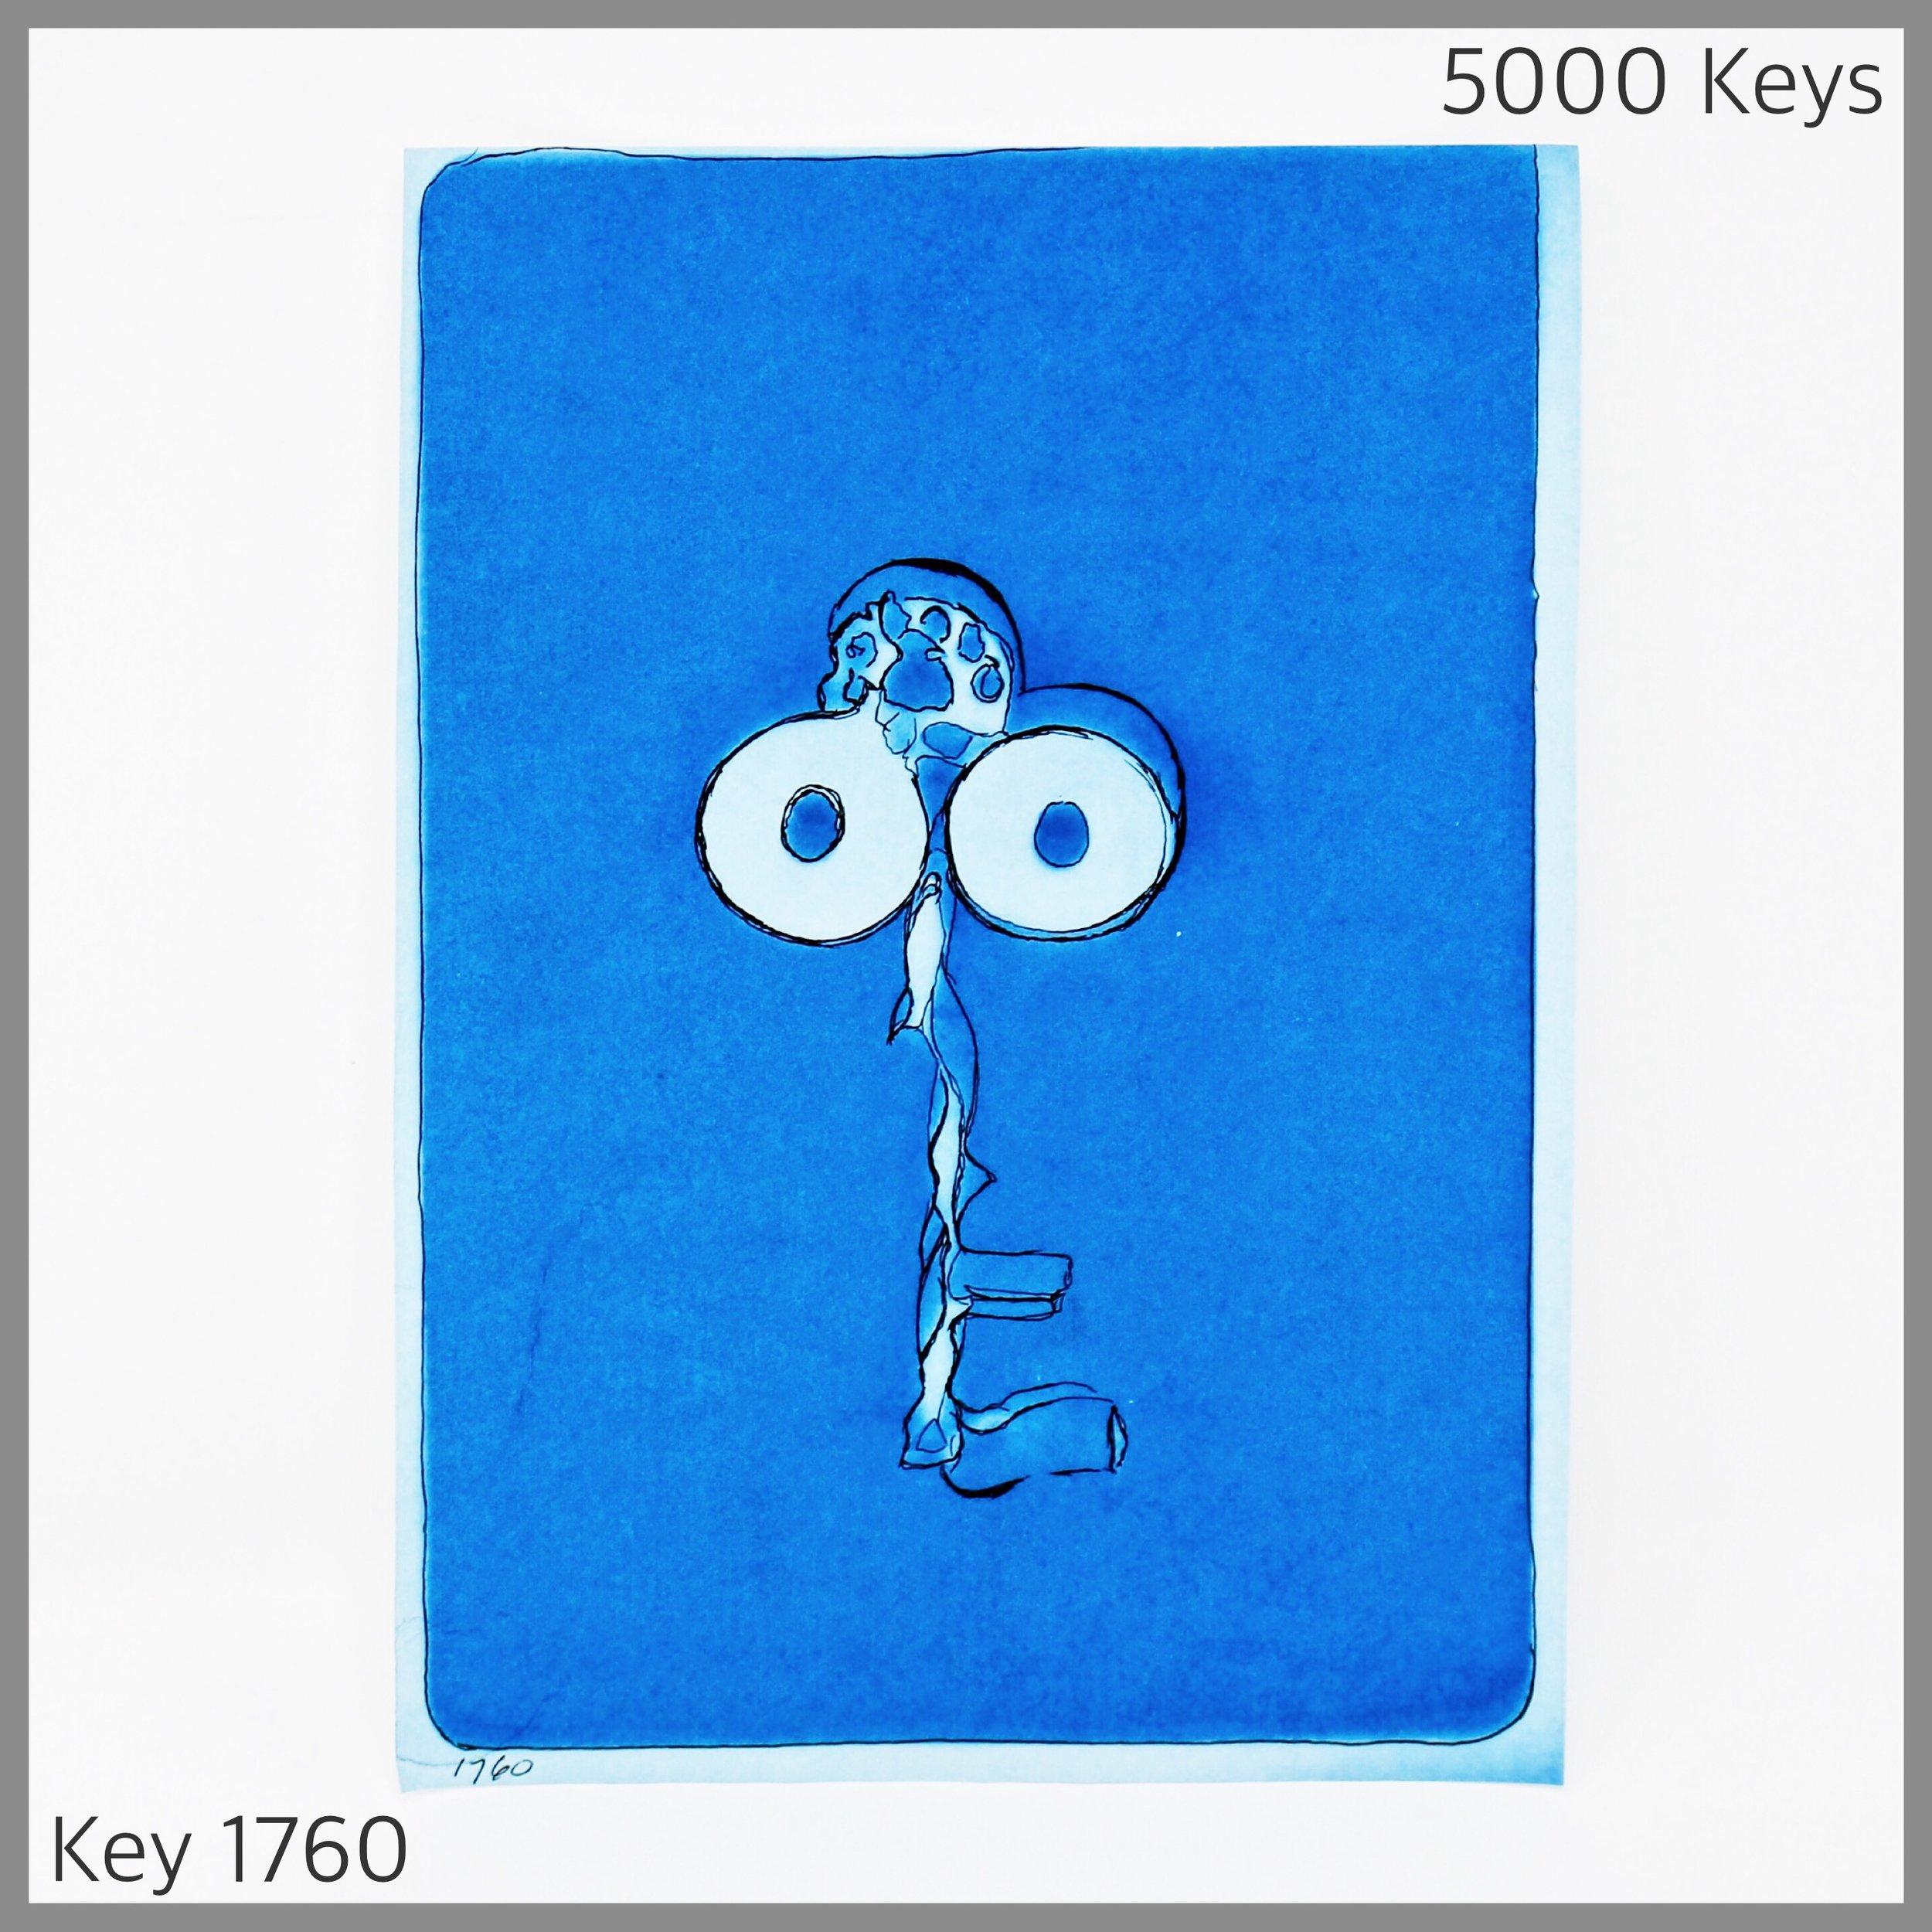 Key 1760 - 1.JPG